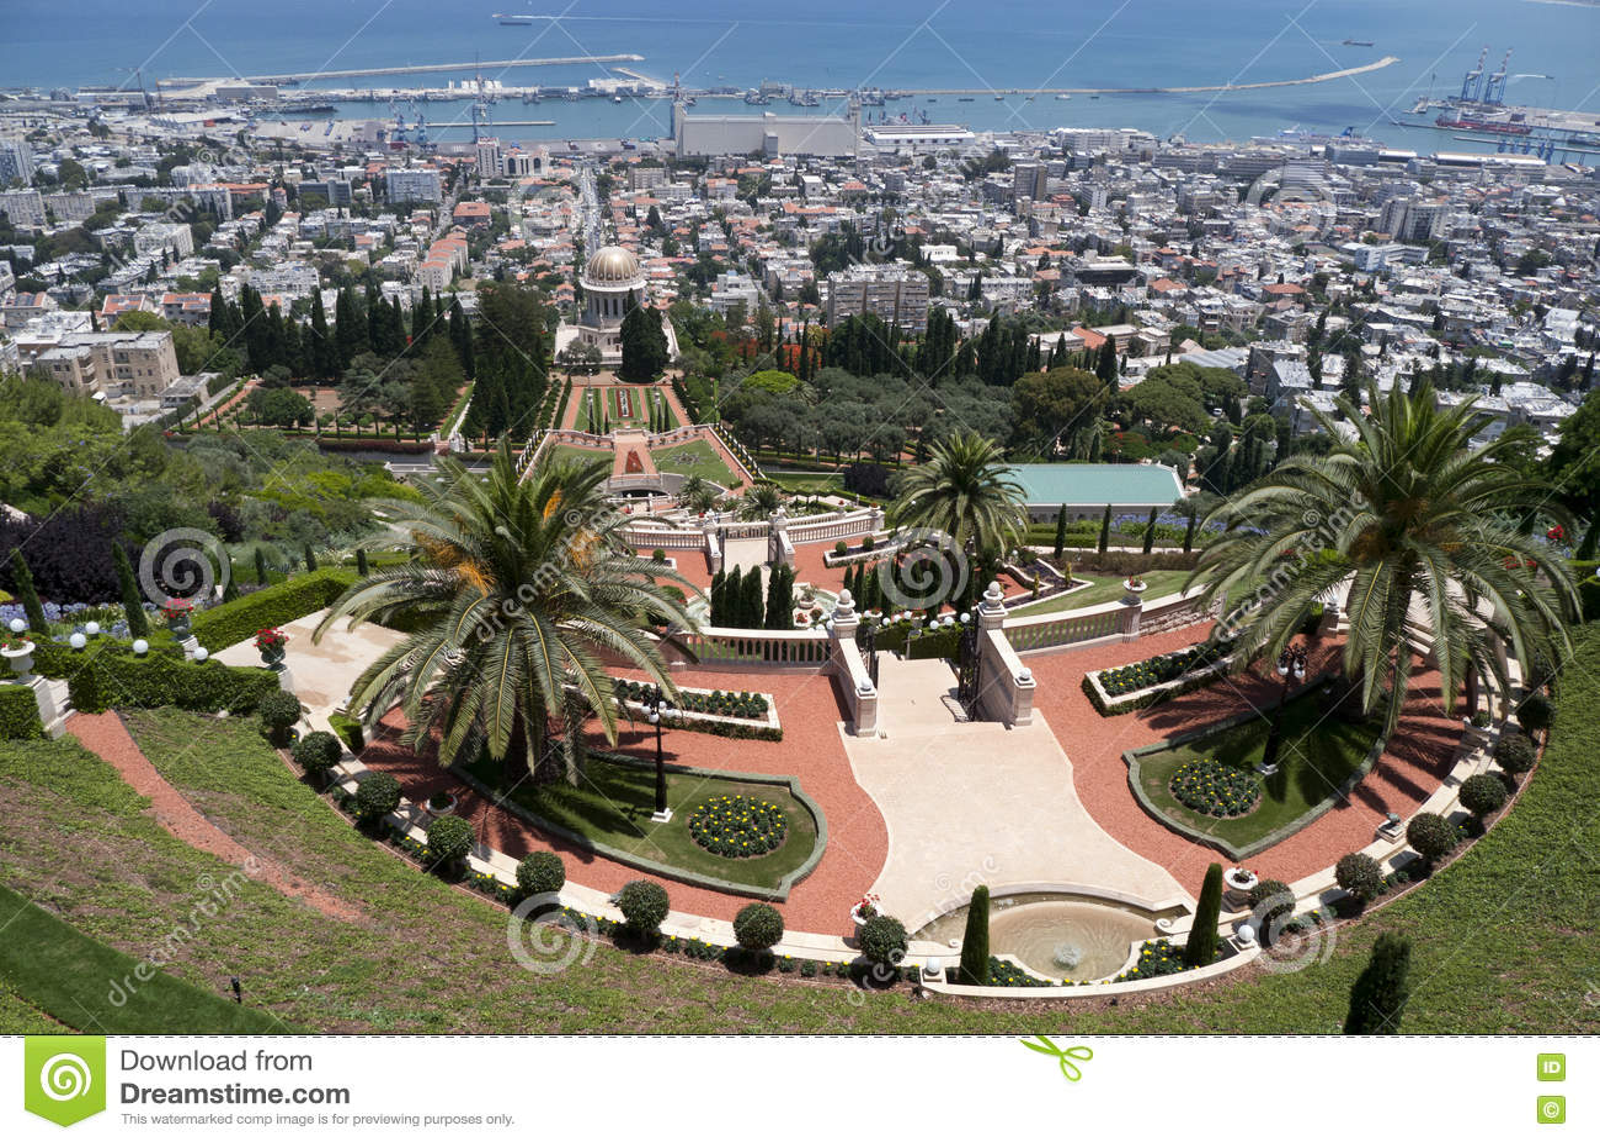 Israel, Haifa city: attractions, description photo